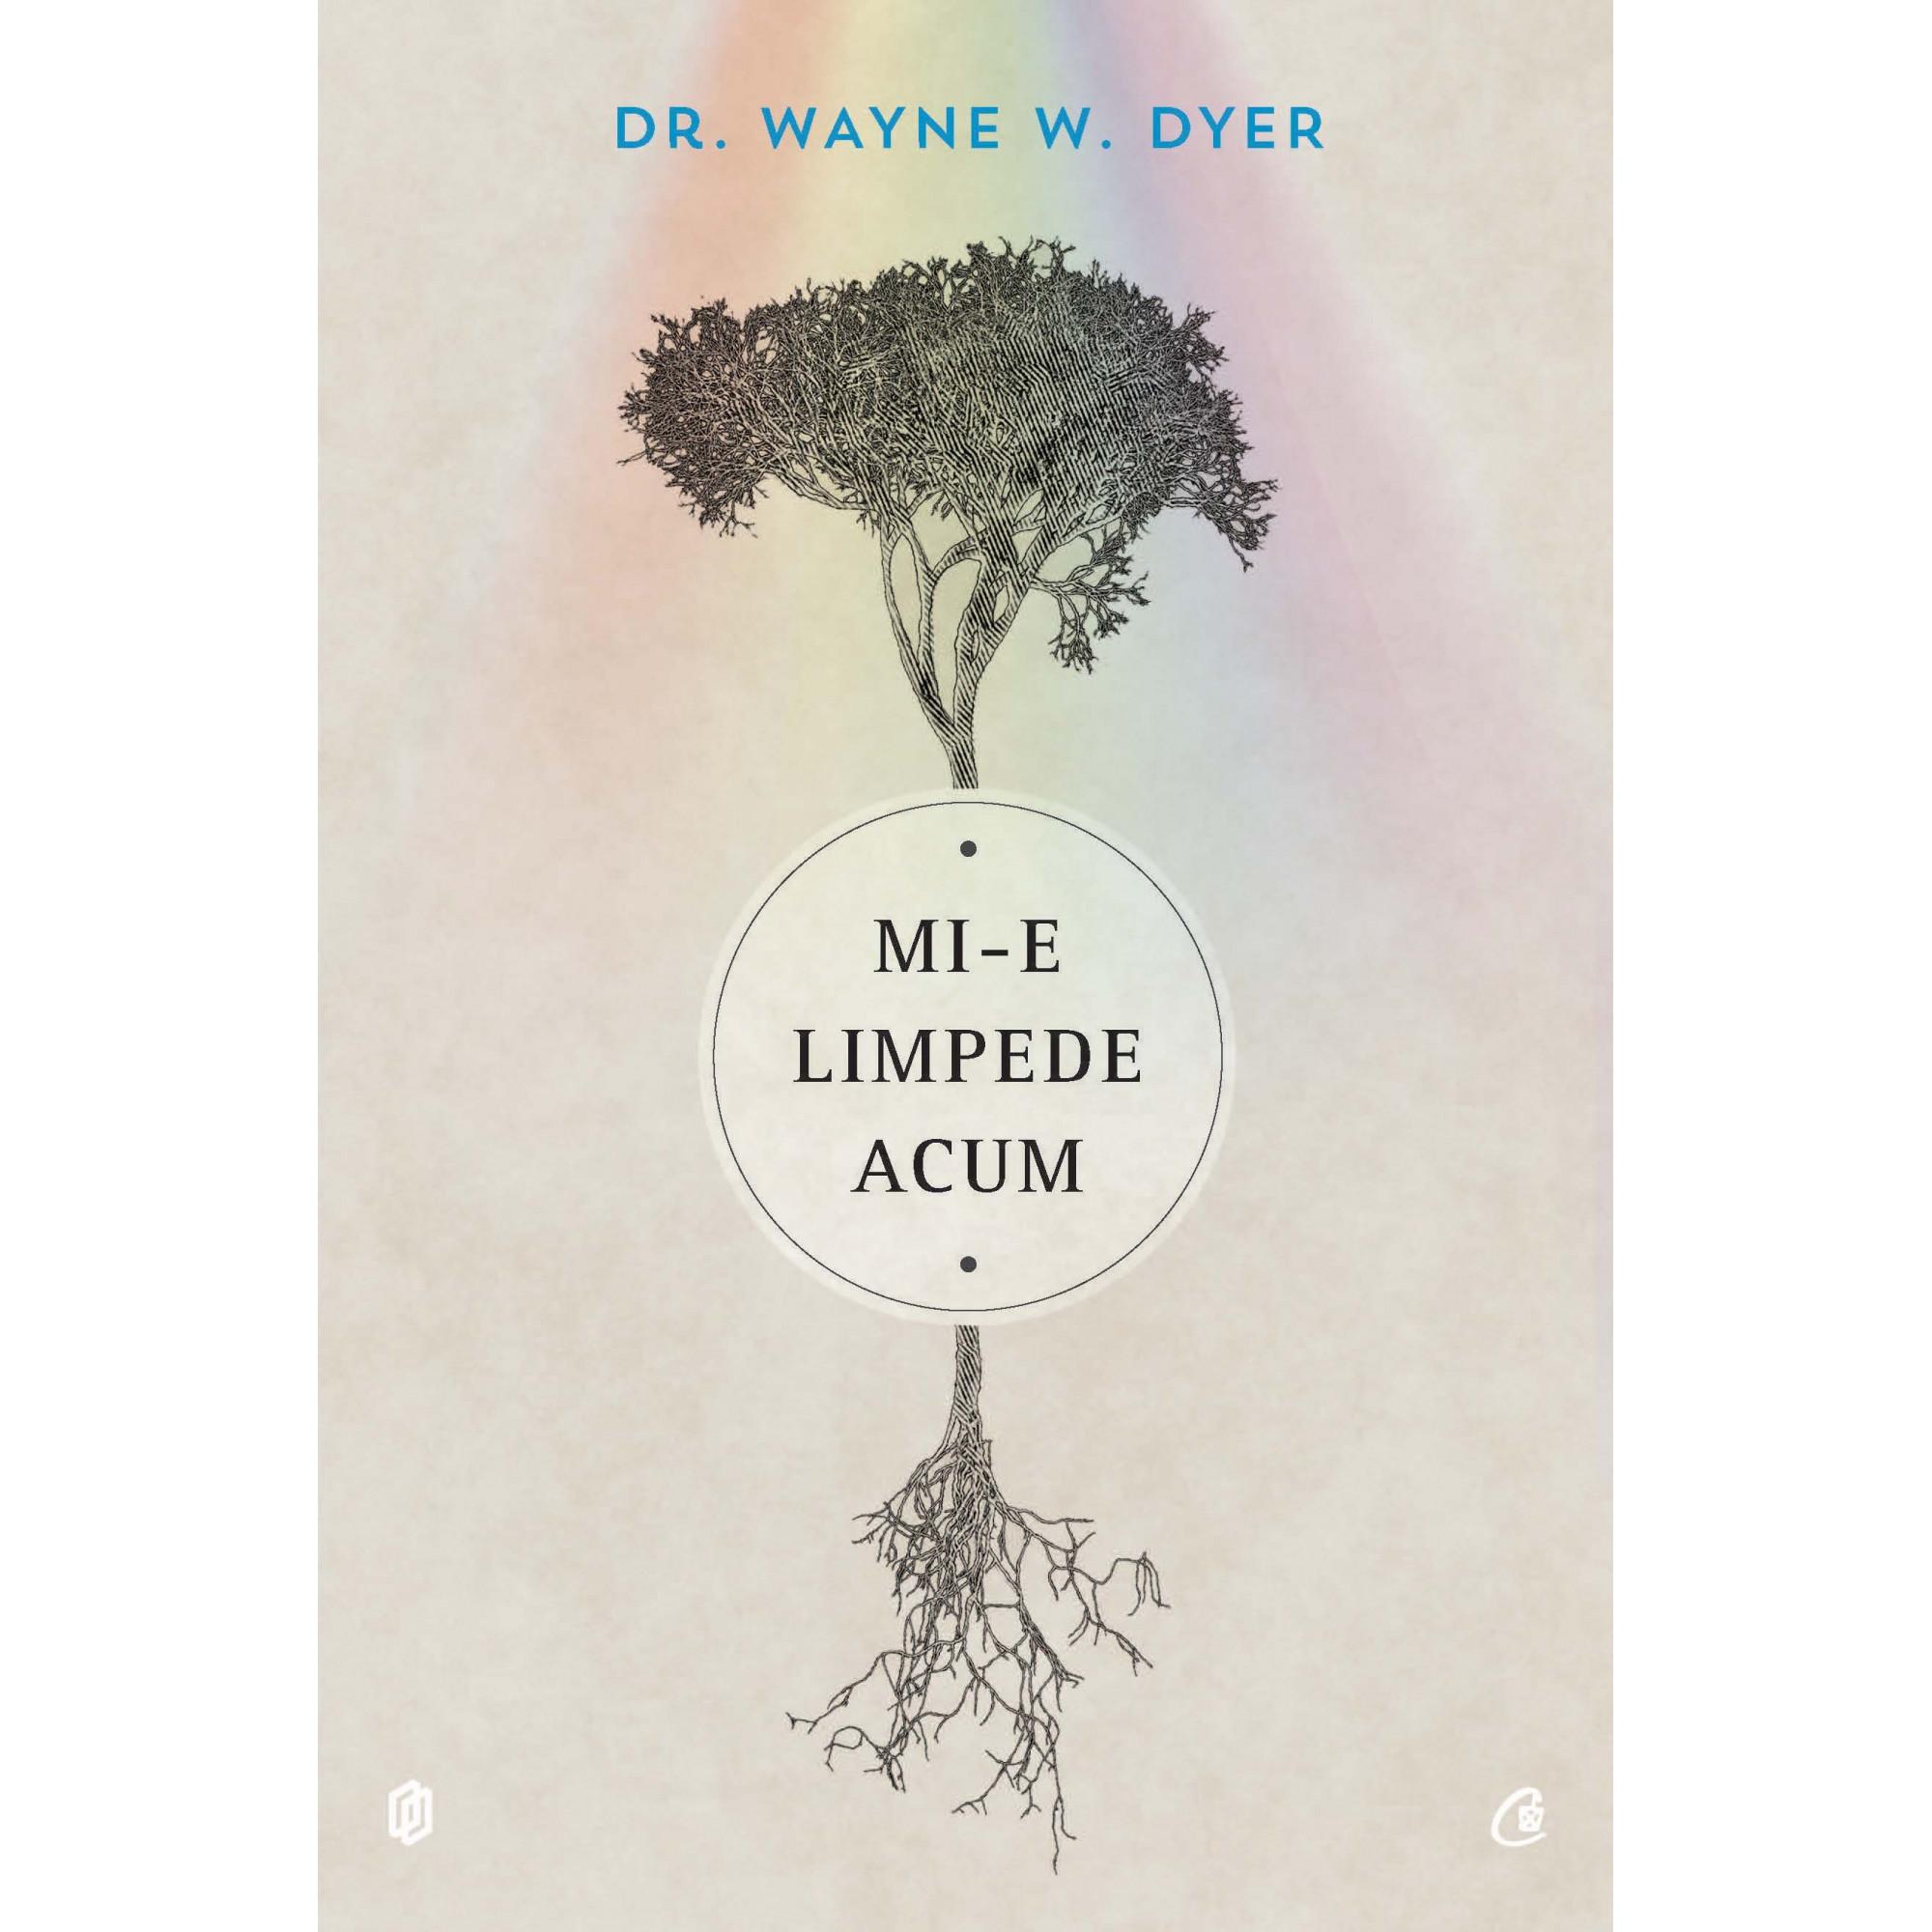 Mi-e limpede acum; Dr. Wayne W. Dyer